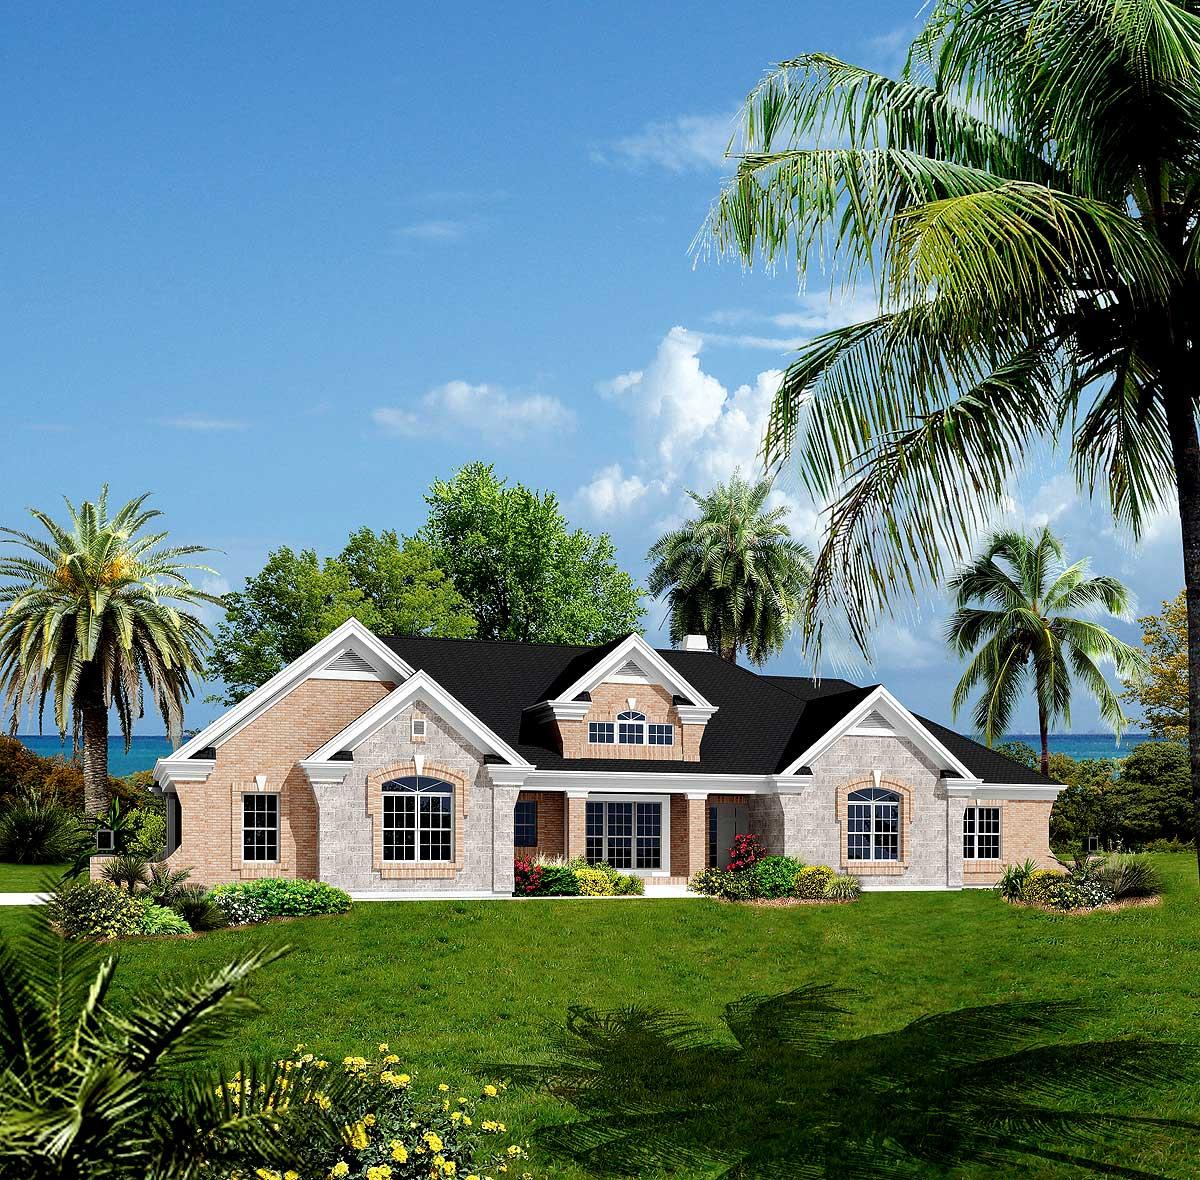 Atrium Ranch Home Plan with Sunroom - 57155HA ...